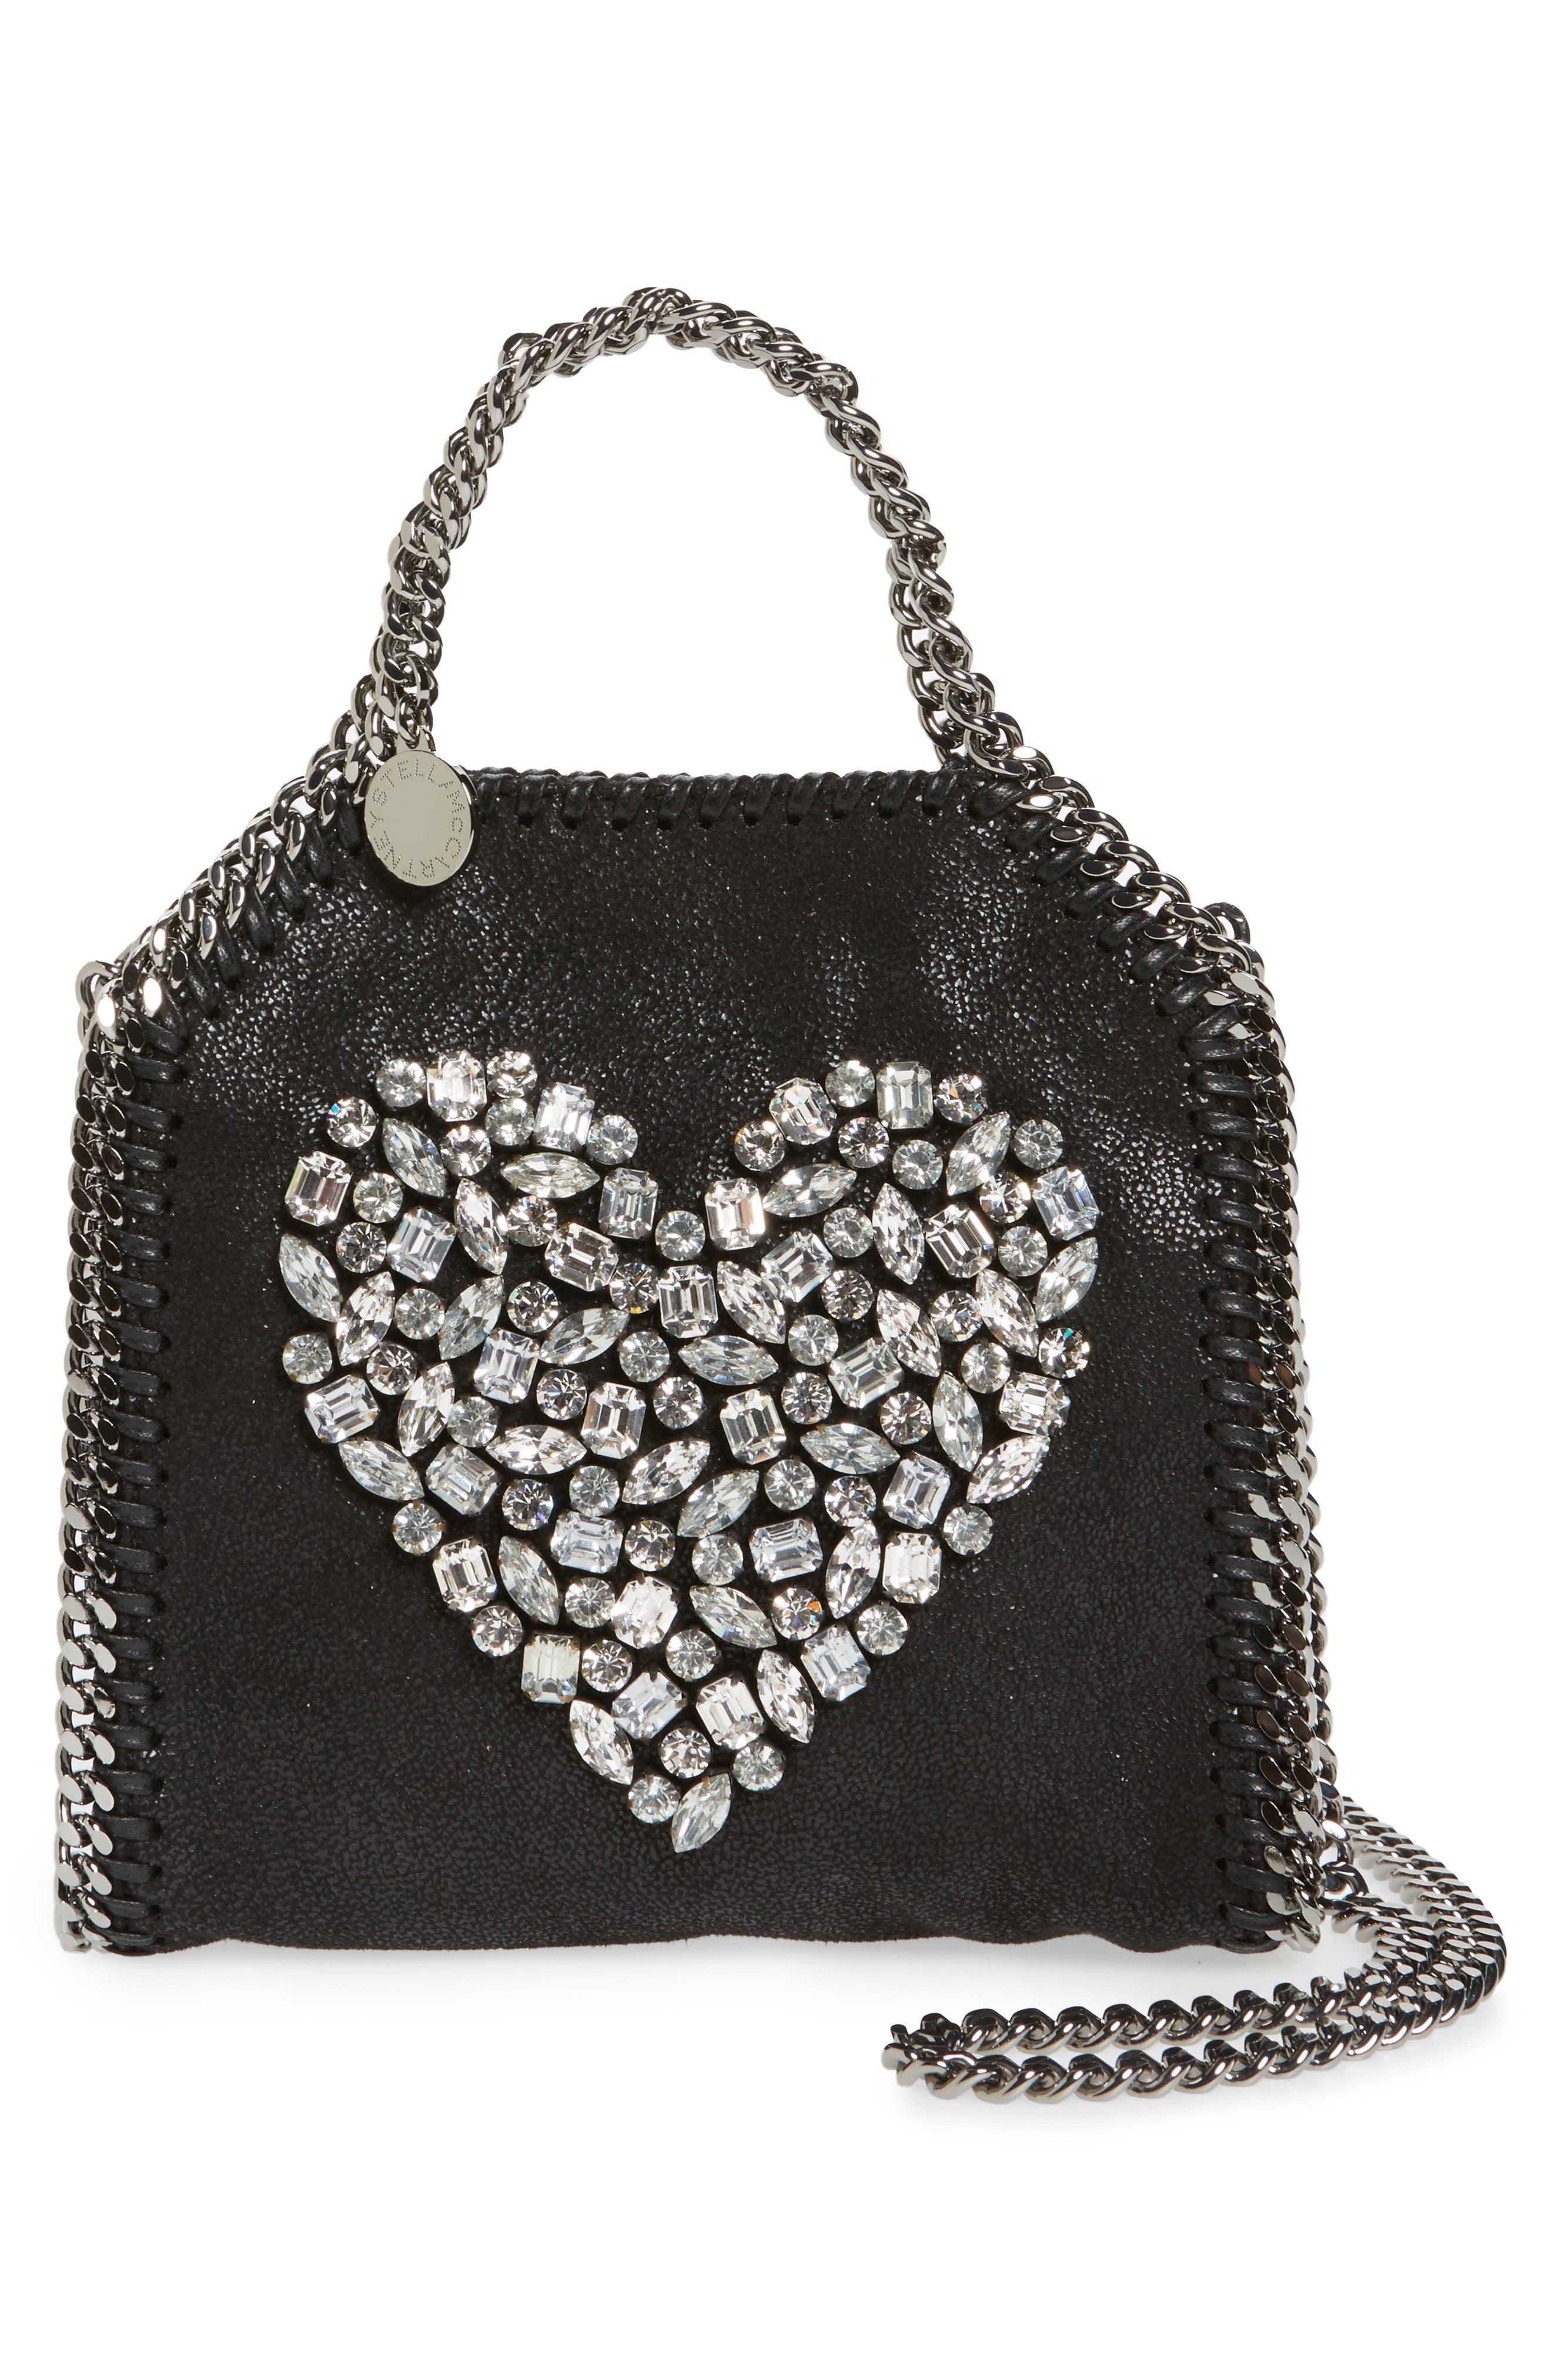 Stella McCartney Tiny Falabella Faux Leather Crossbody Bag